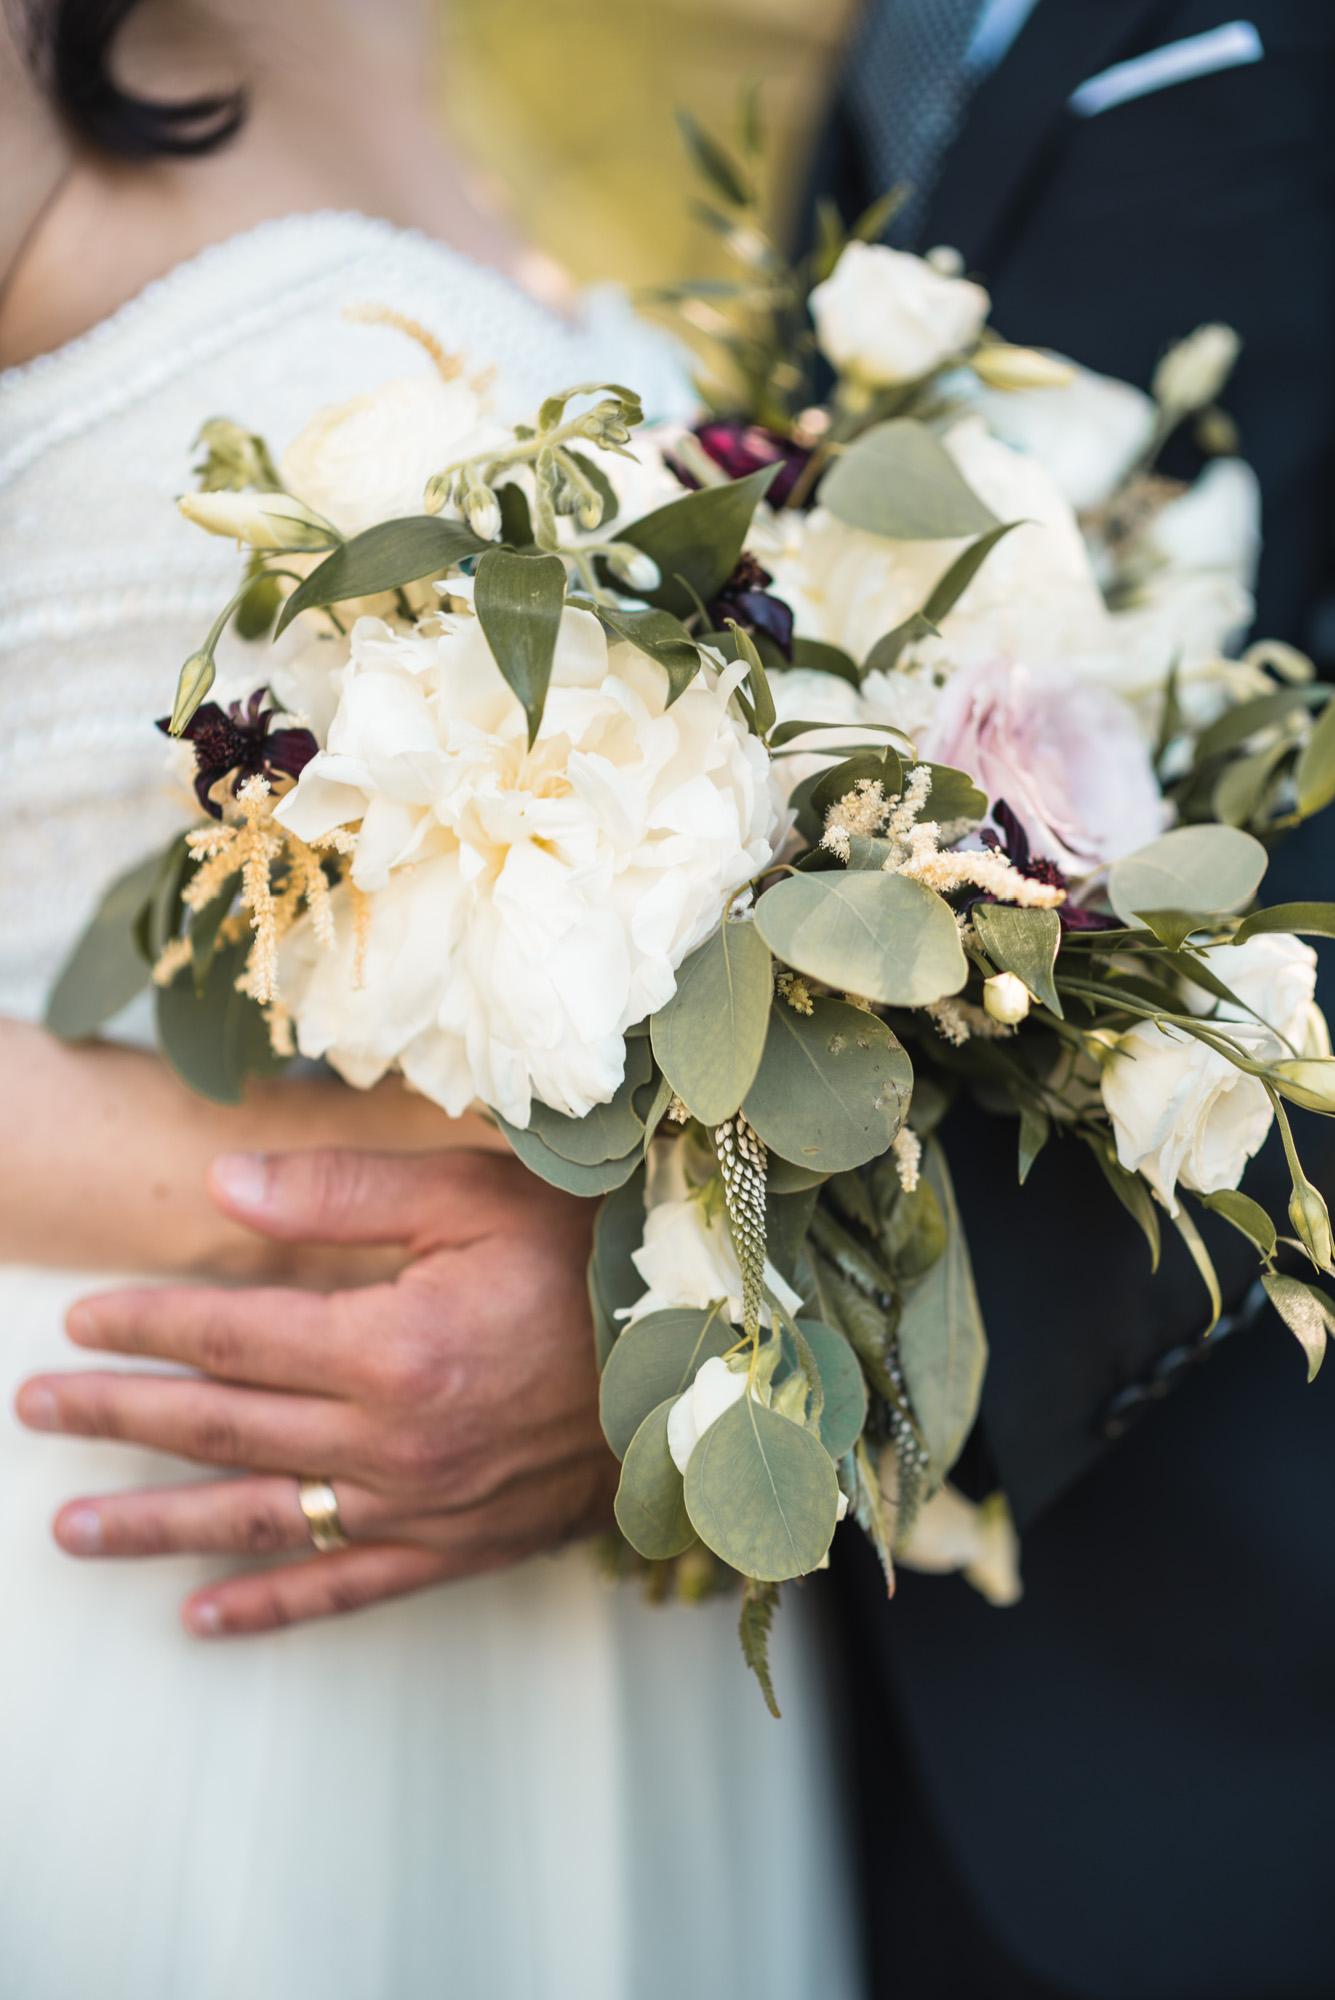 20170624-WeddingDorianaAndAnthony-31.jpg